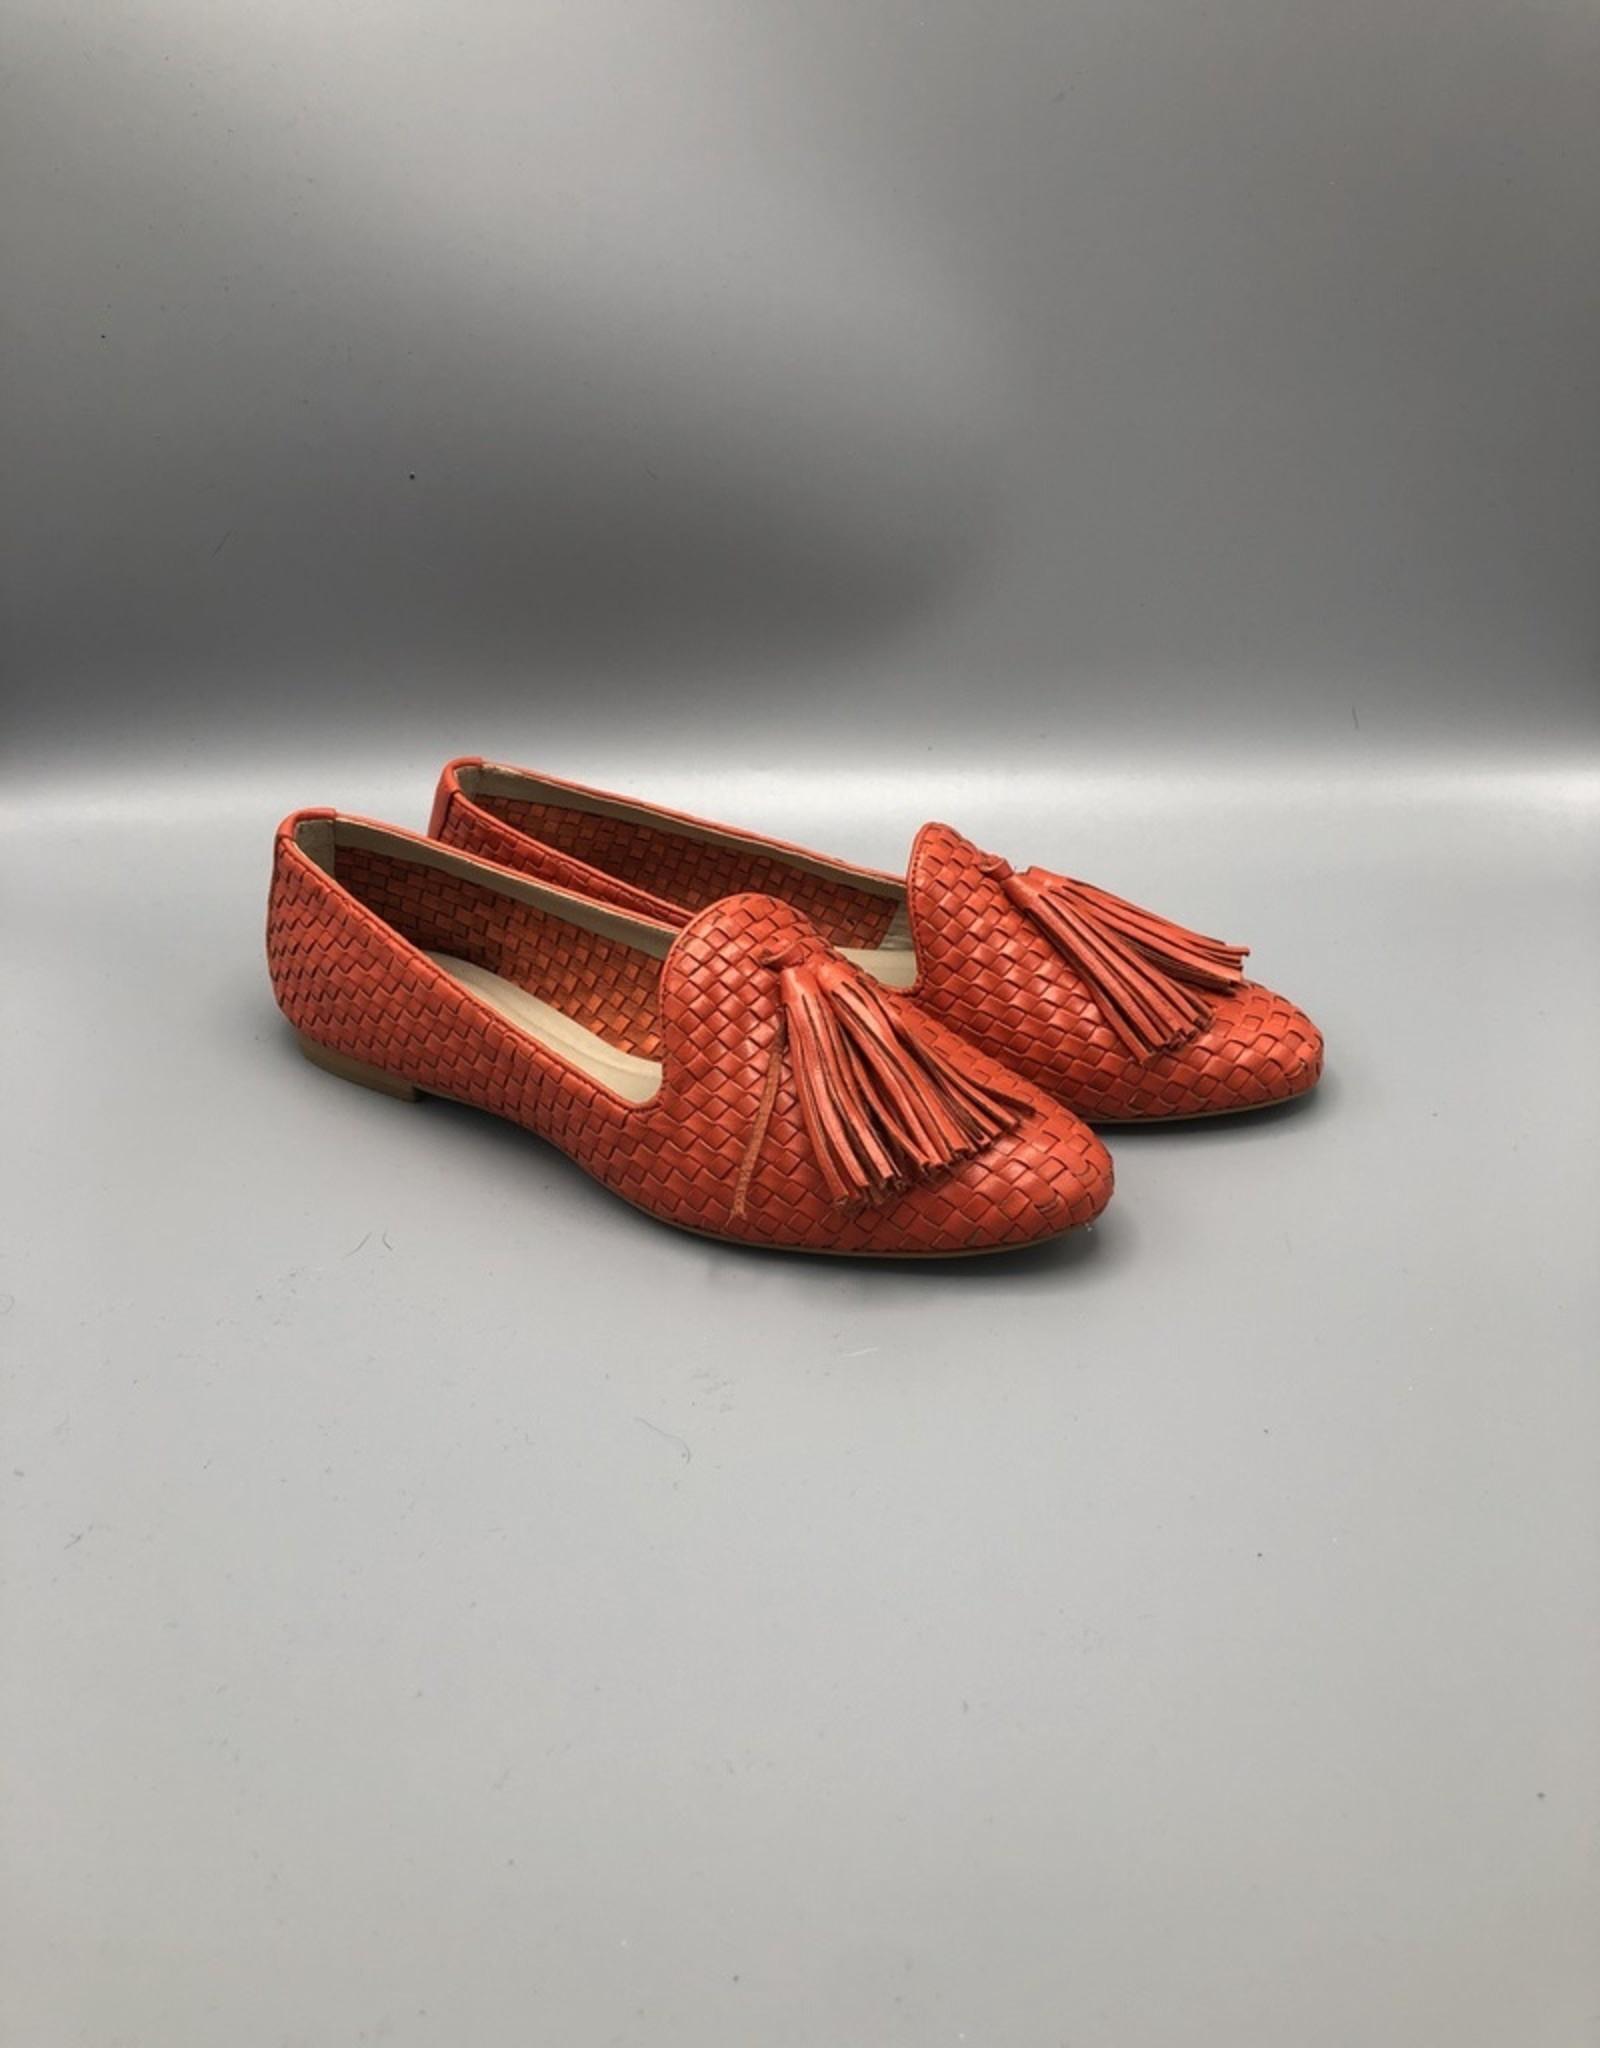 Guilhermina Guilhermina Tassle Braided Leather Loafer